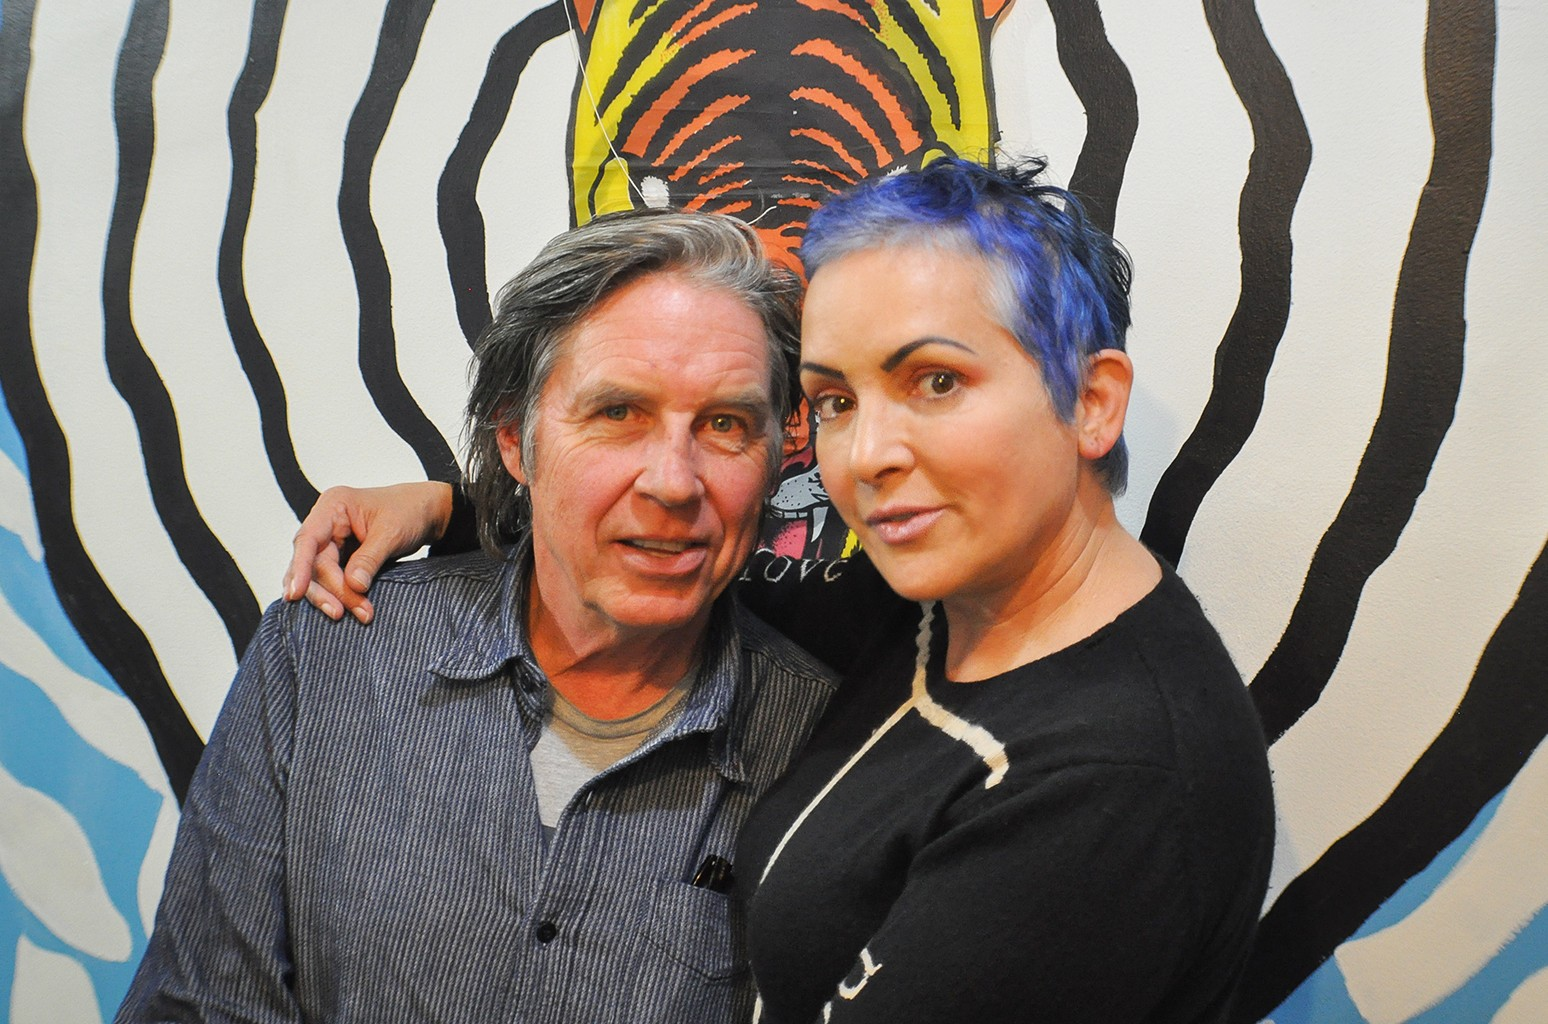 John Doe and Jane Wiedlin 2016